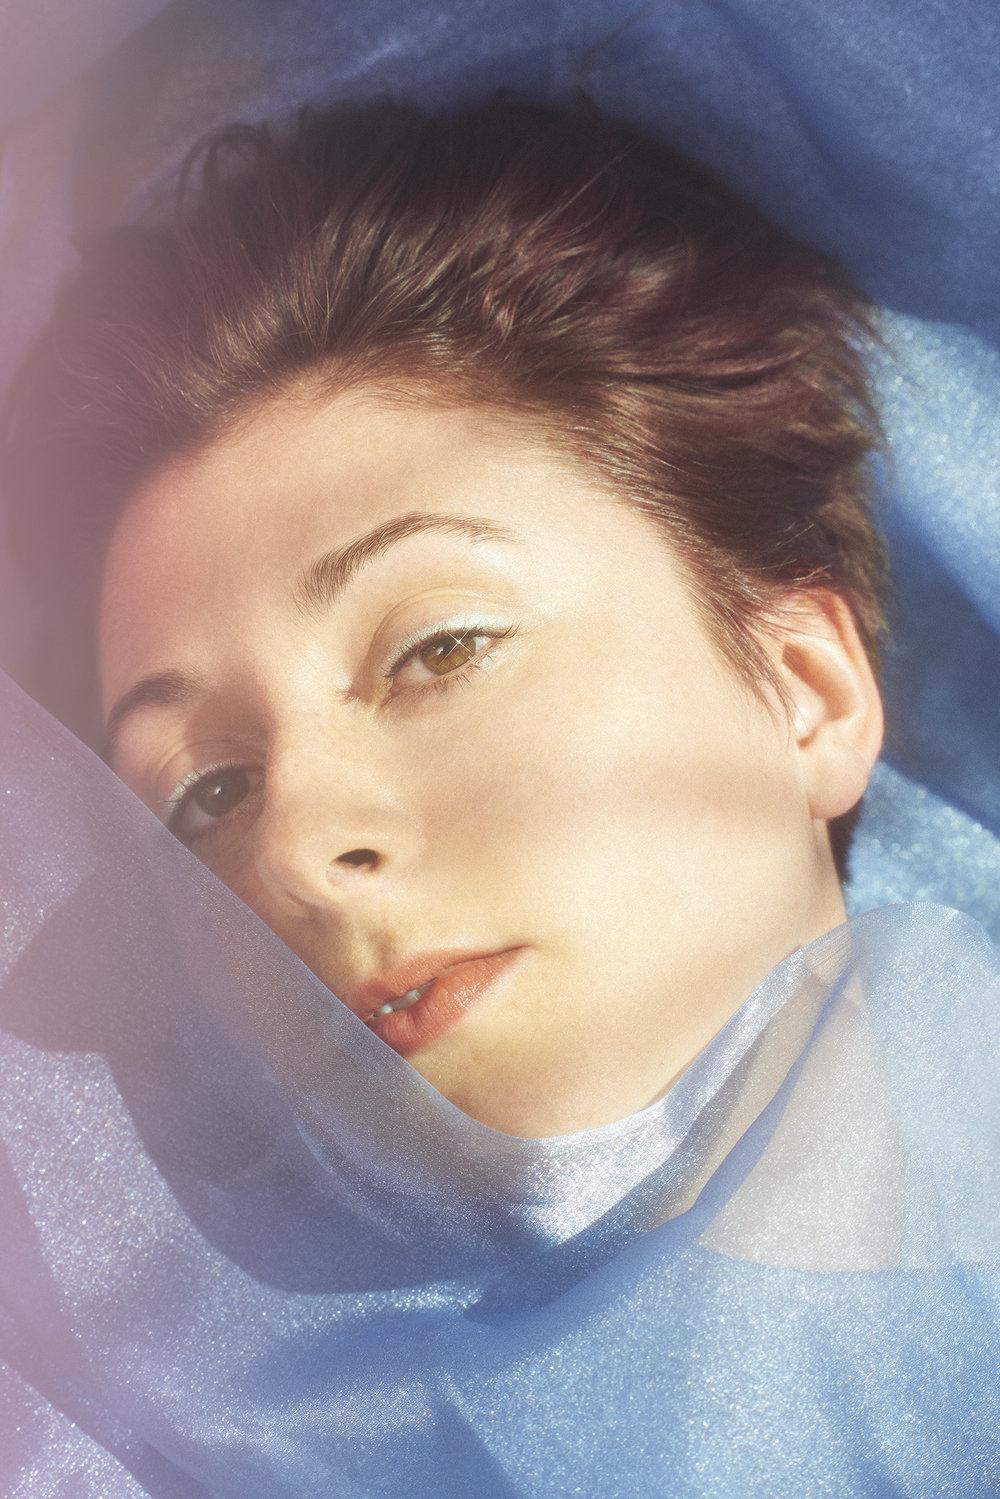 KALKO MY DEMISE  single release, 2018